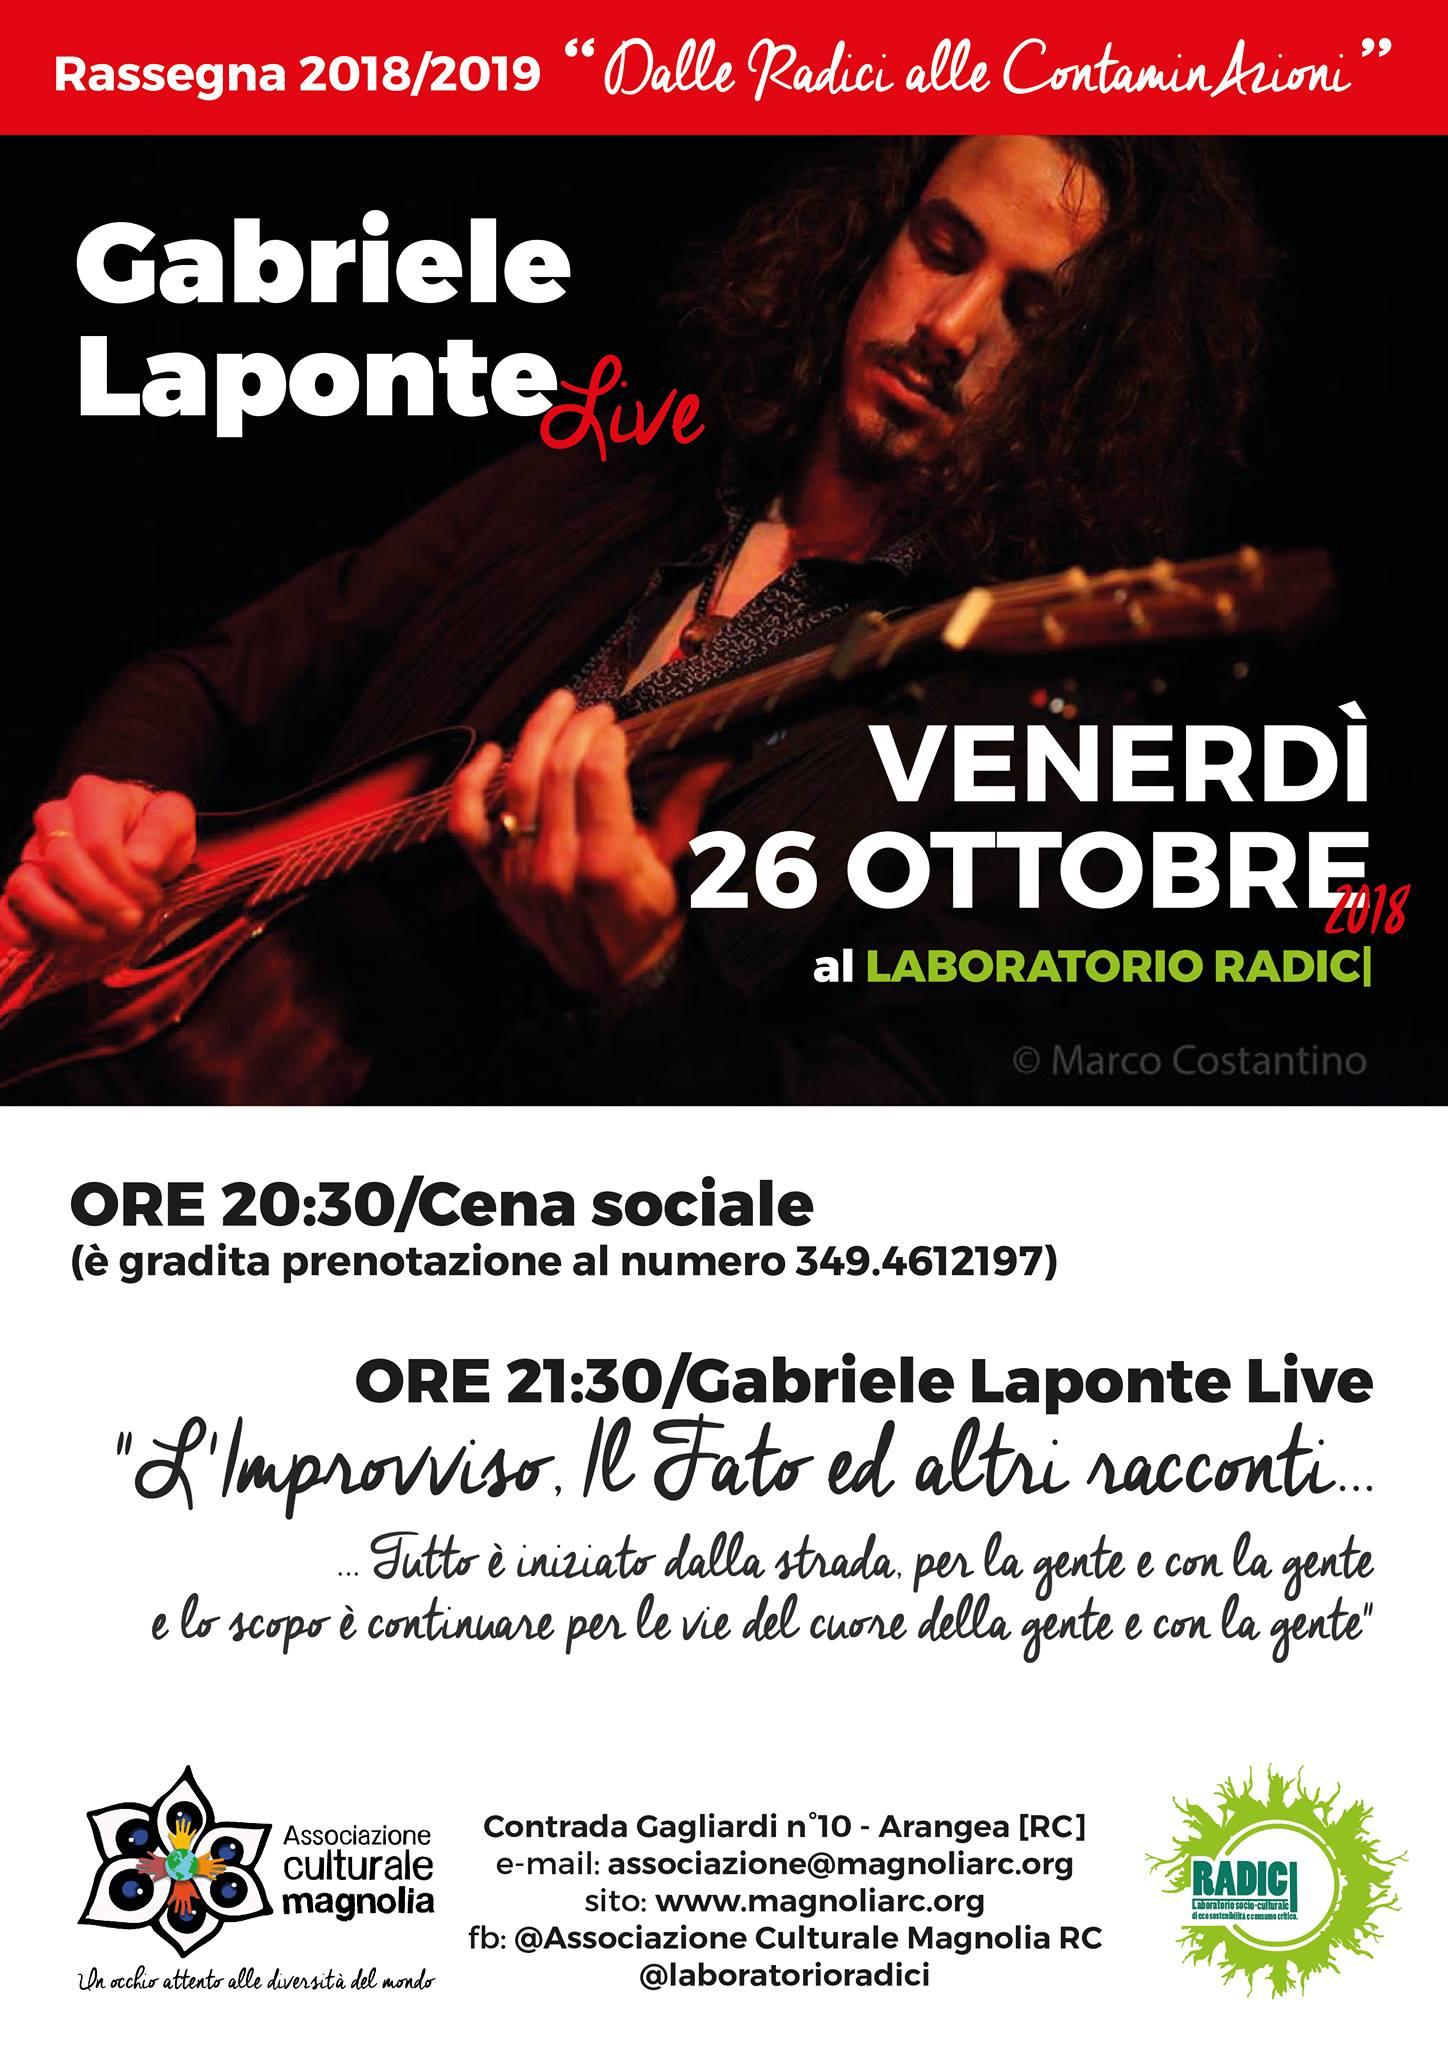 Gabriele Laponte Live